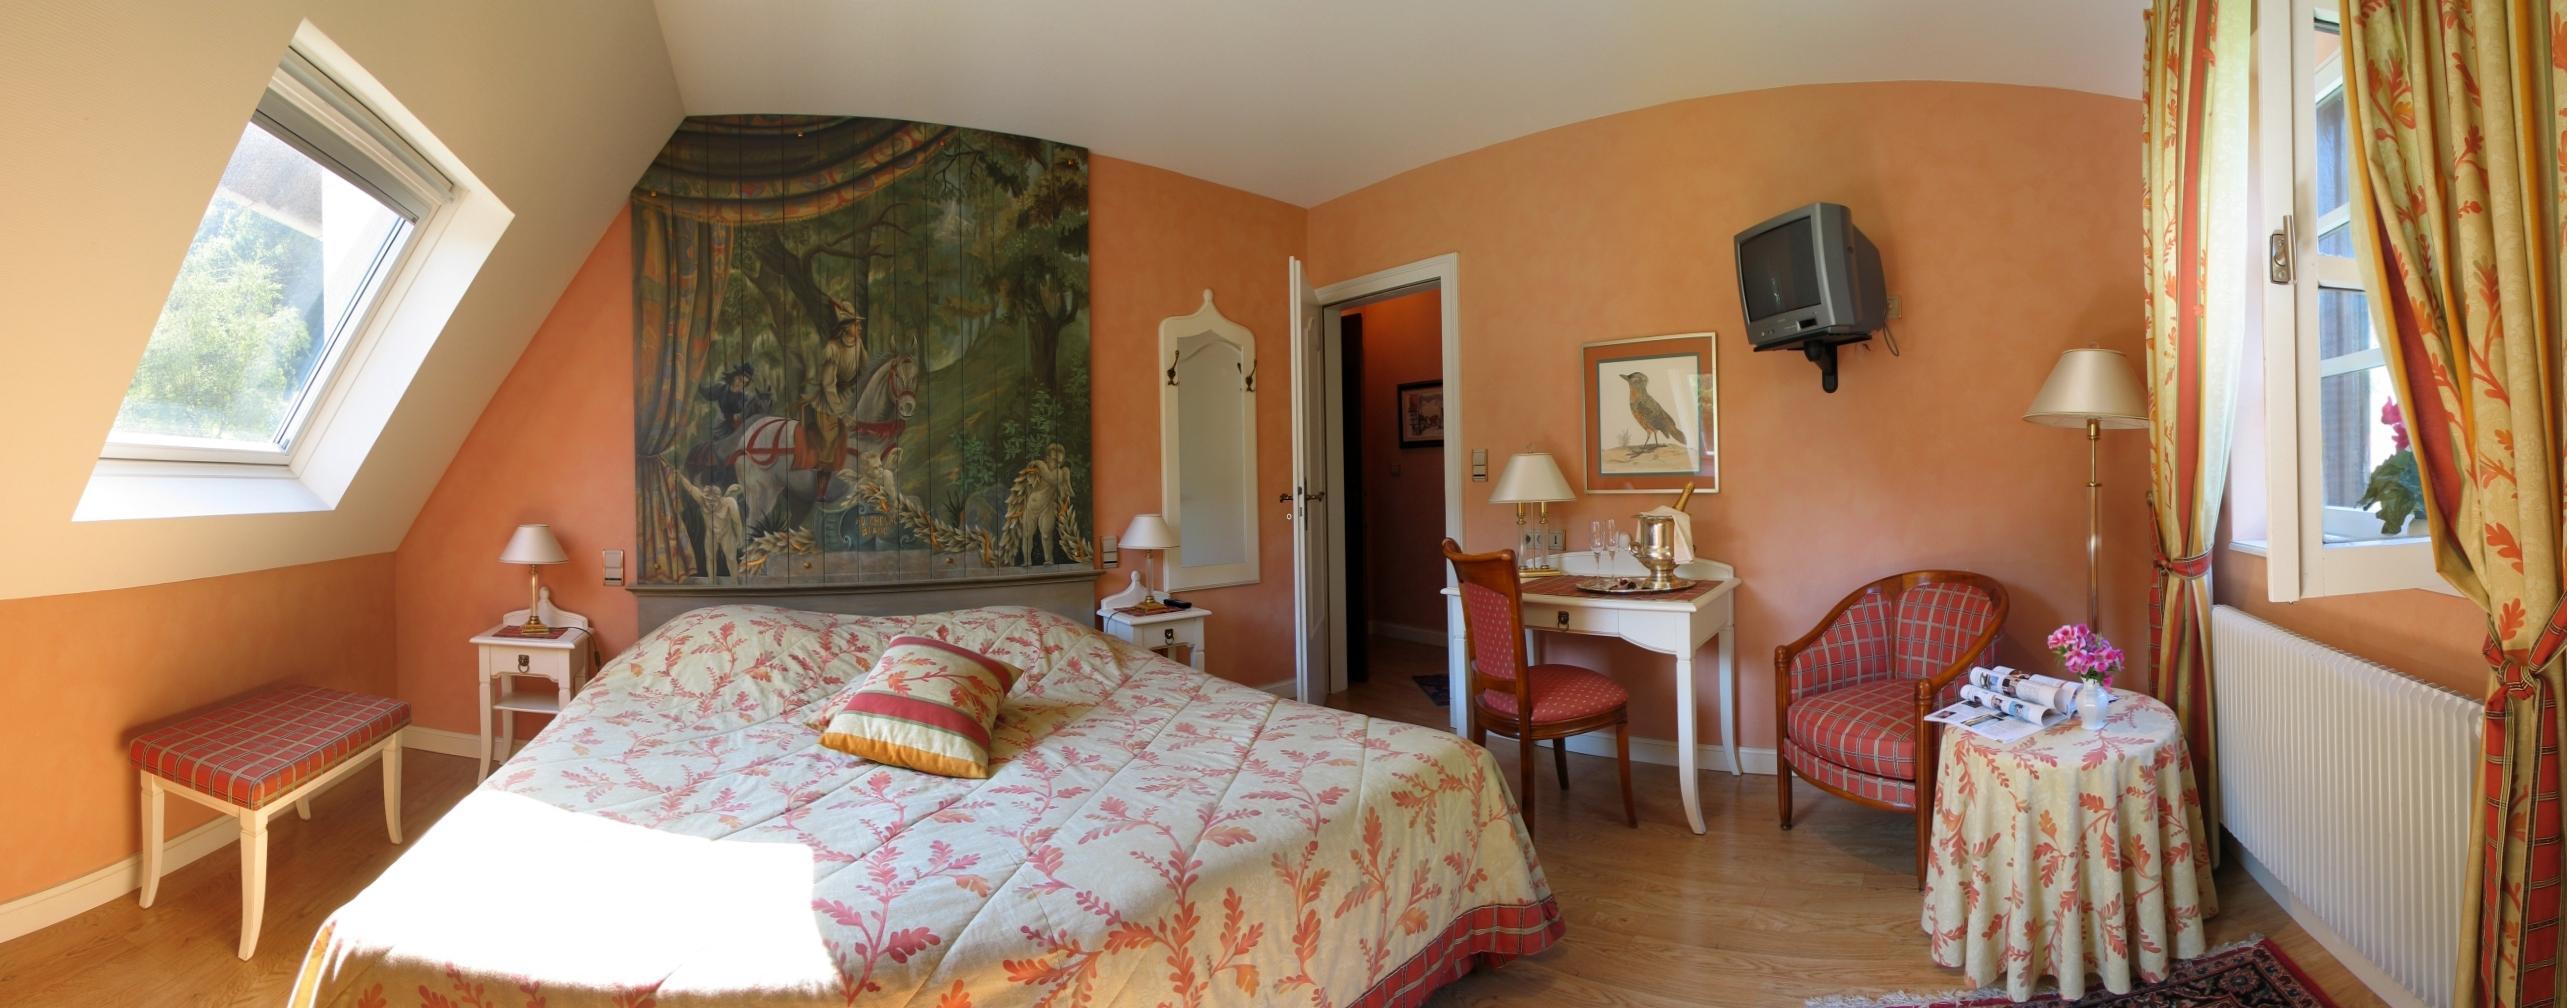 Chambre calme dans la villa du jardin